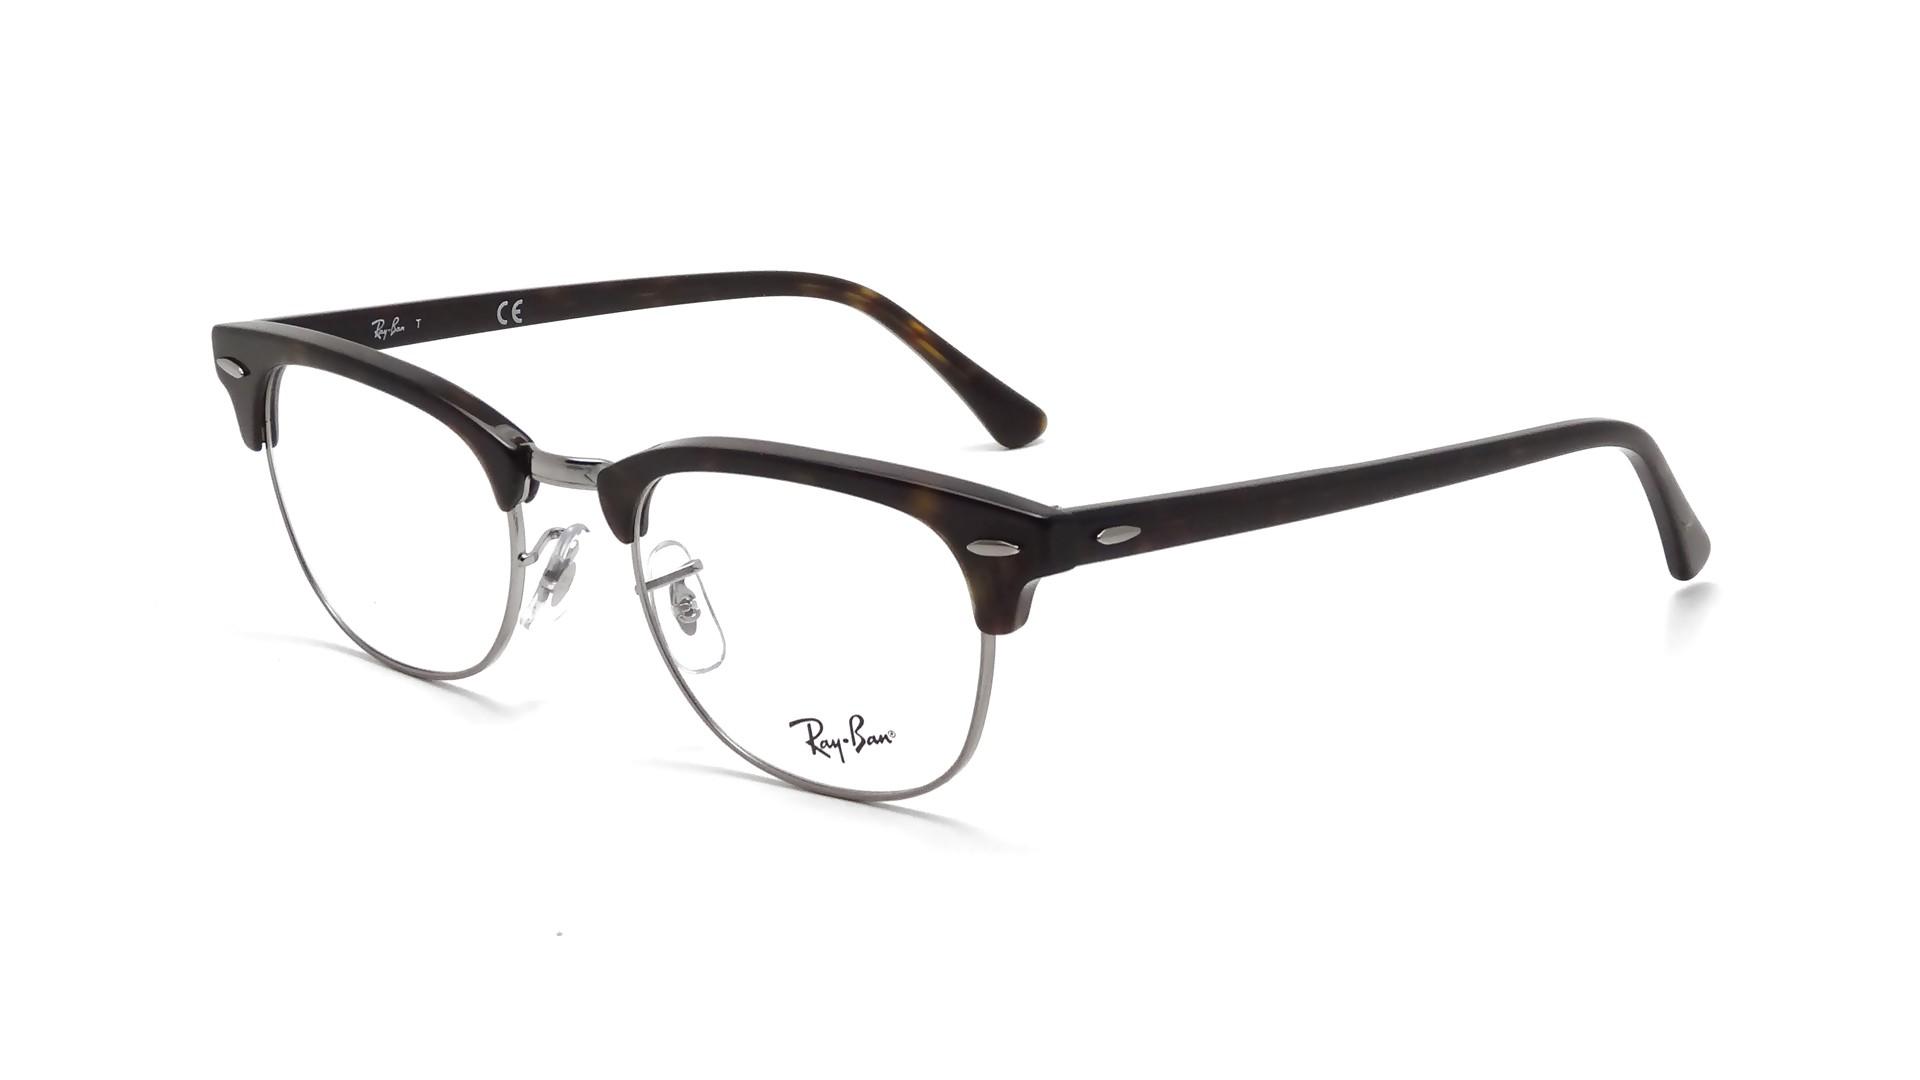 Eyeglass Frame Repair In Queens Ny : Rb5154 Clubmaster Eyeglasses Price www.tapdance.org